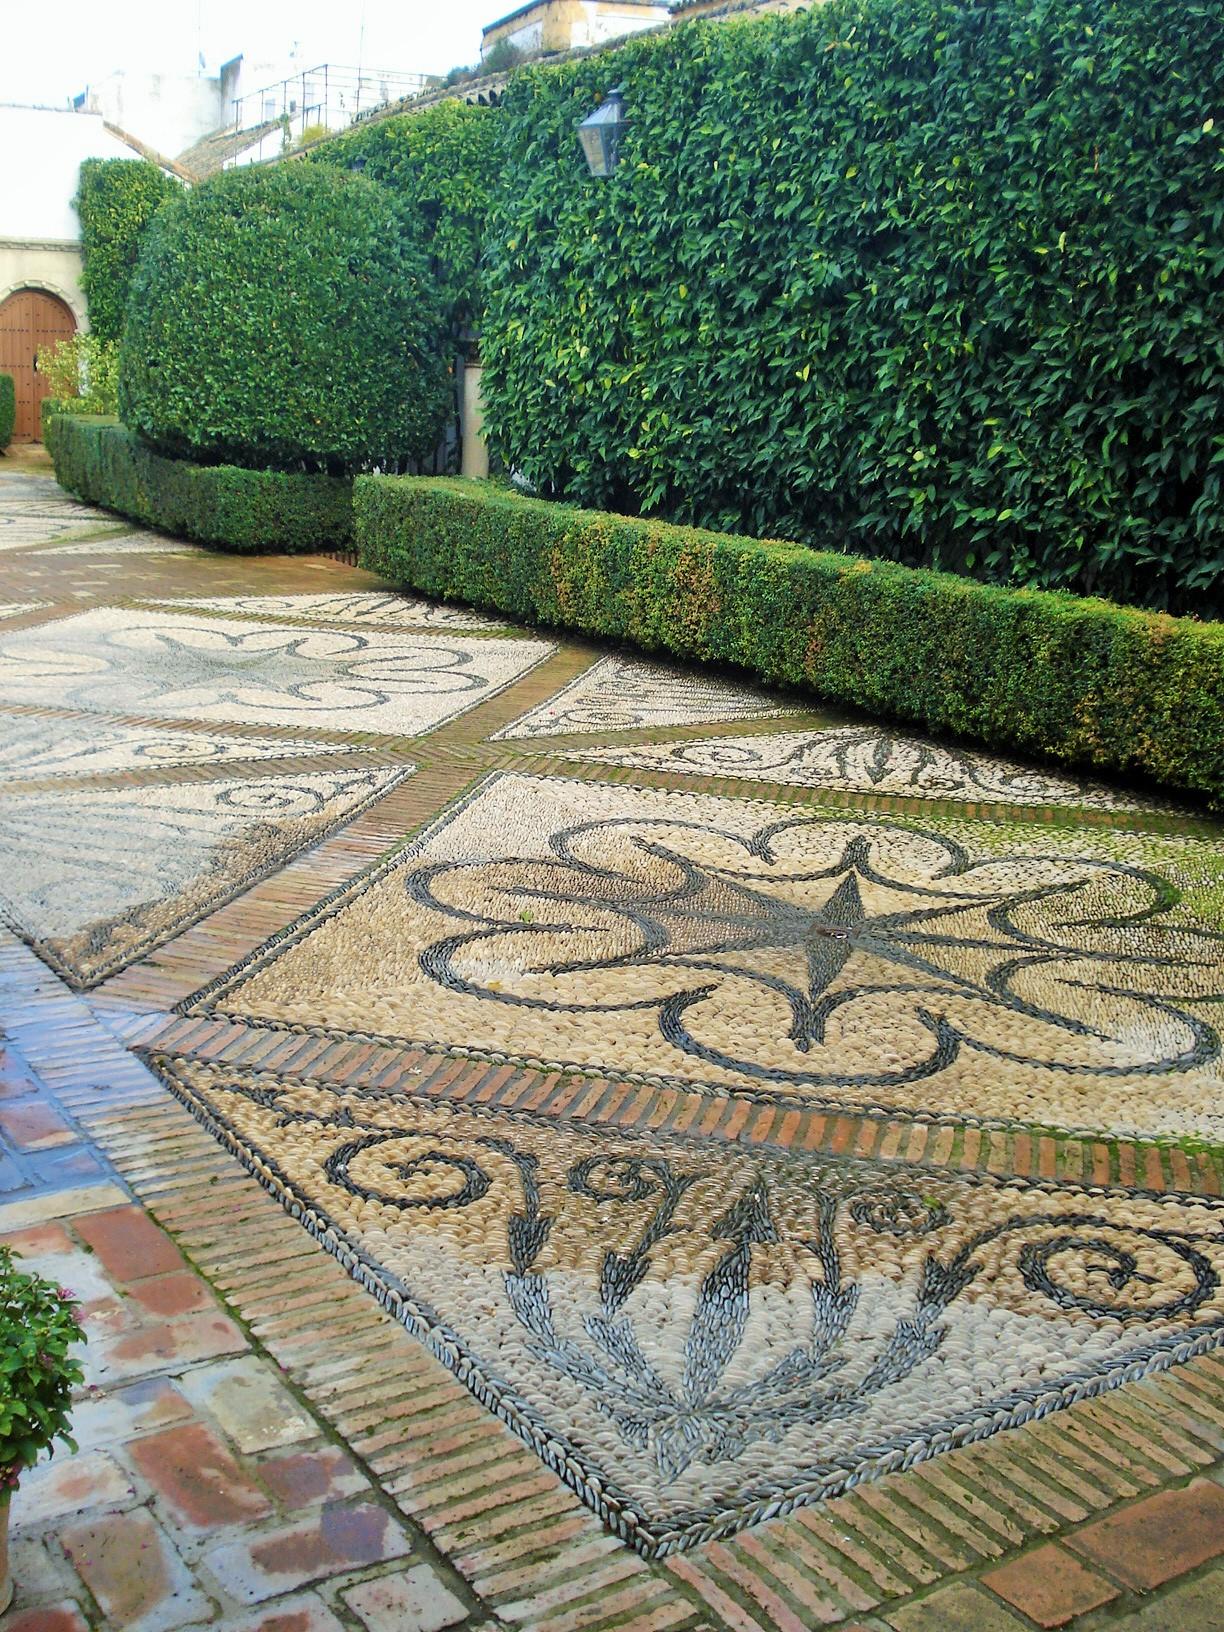 Courtyard U0026 Patio Designs, Spain